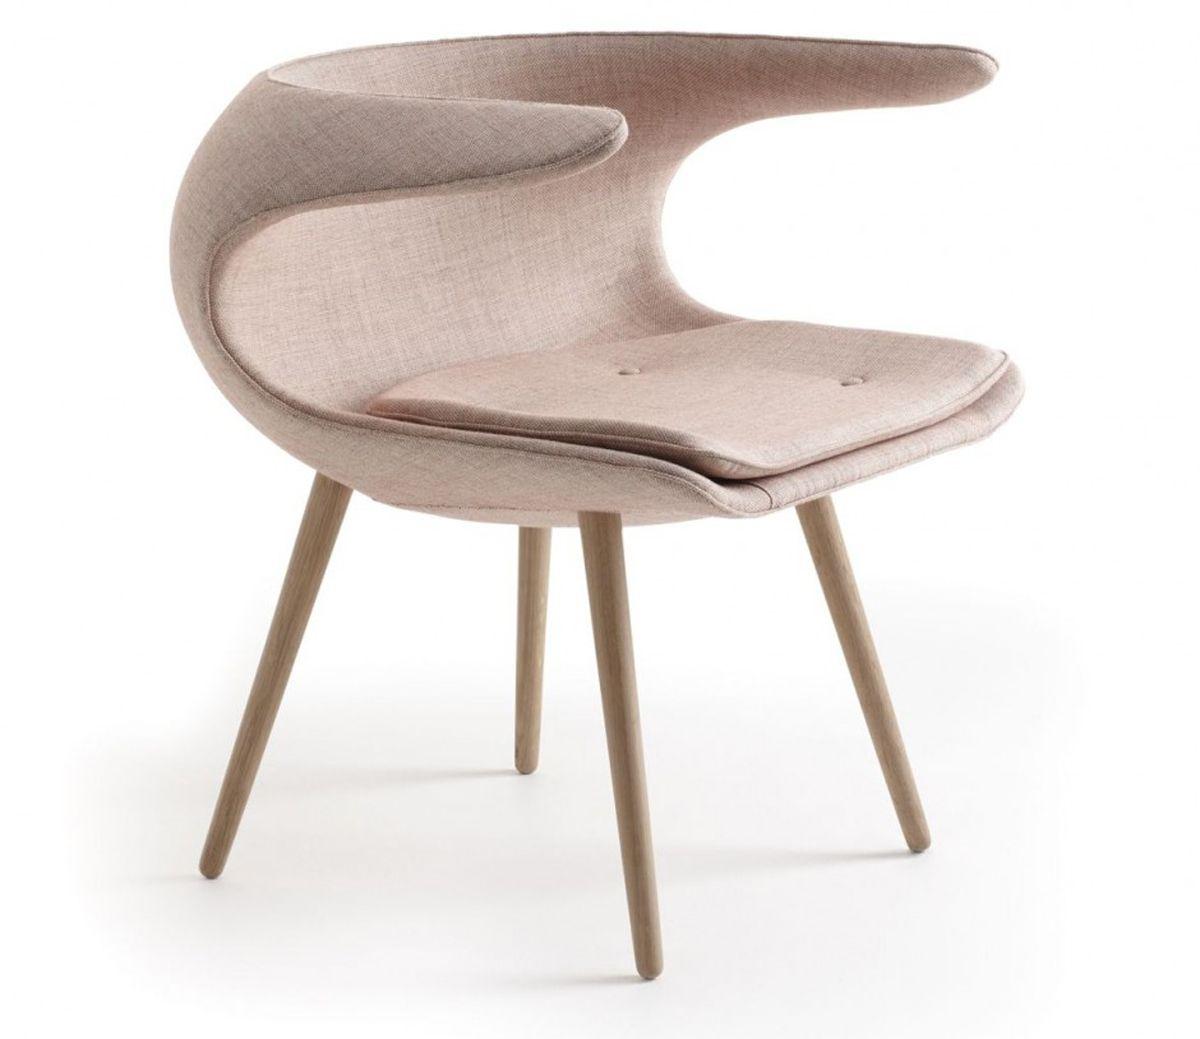 Lovely Modern Furniture : Scandinavian Unique Chair Design By Furnid Scandinavian  Furniture ~ Glubdub